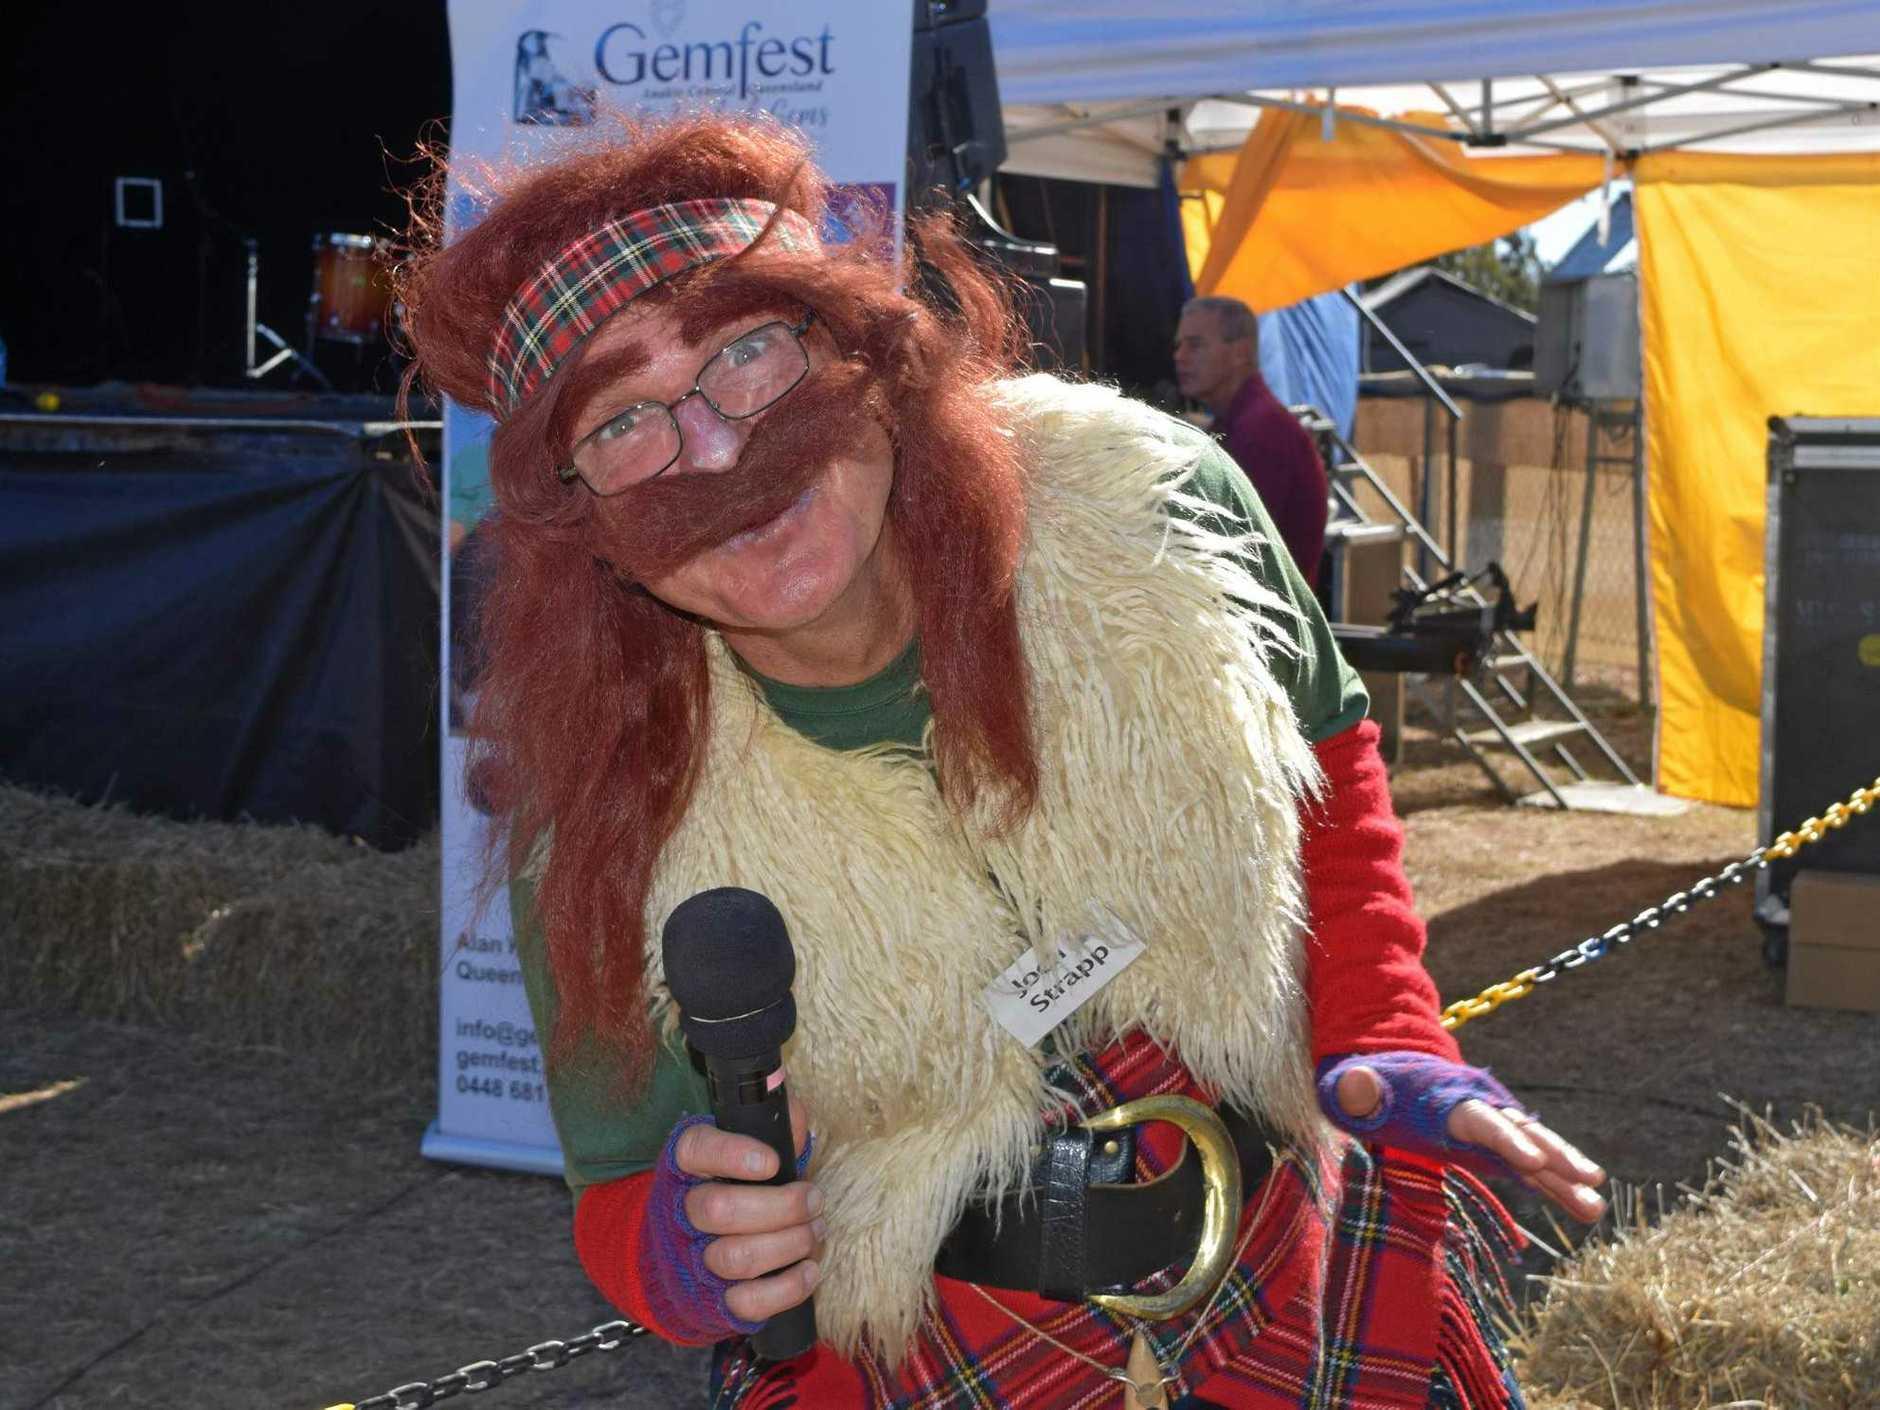 OH AYE: Gemfest's MC for Friday was Scottish Highlander Joch Strapp.